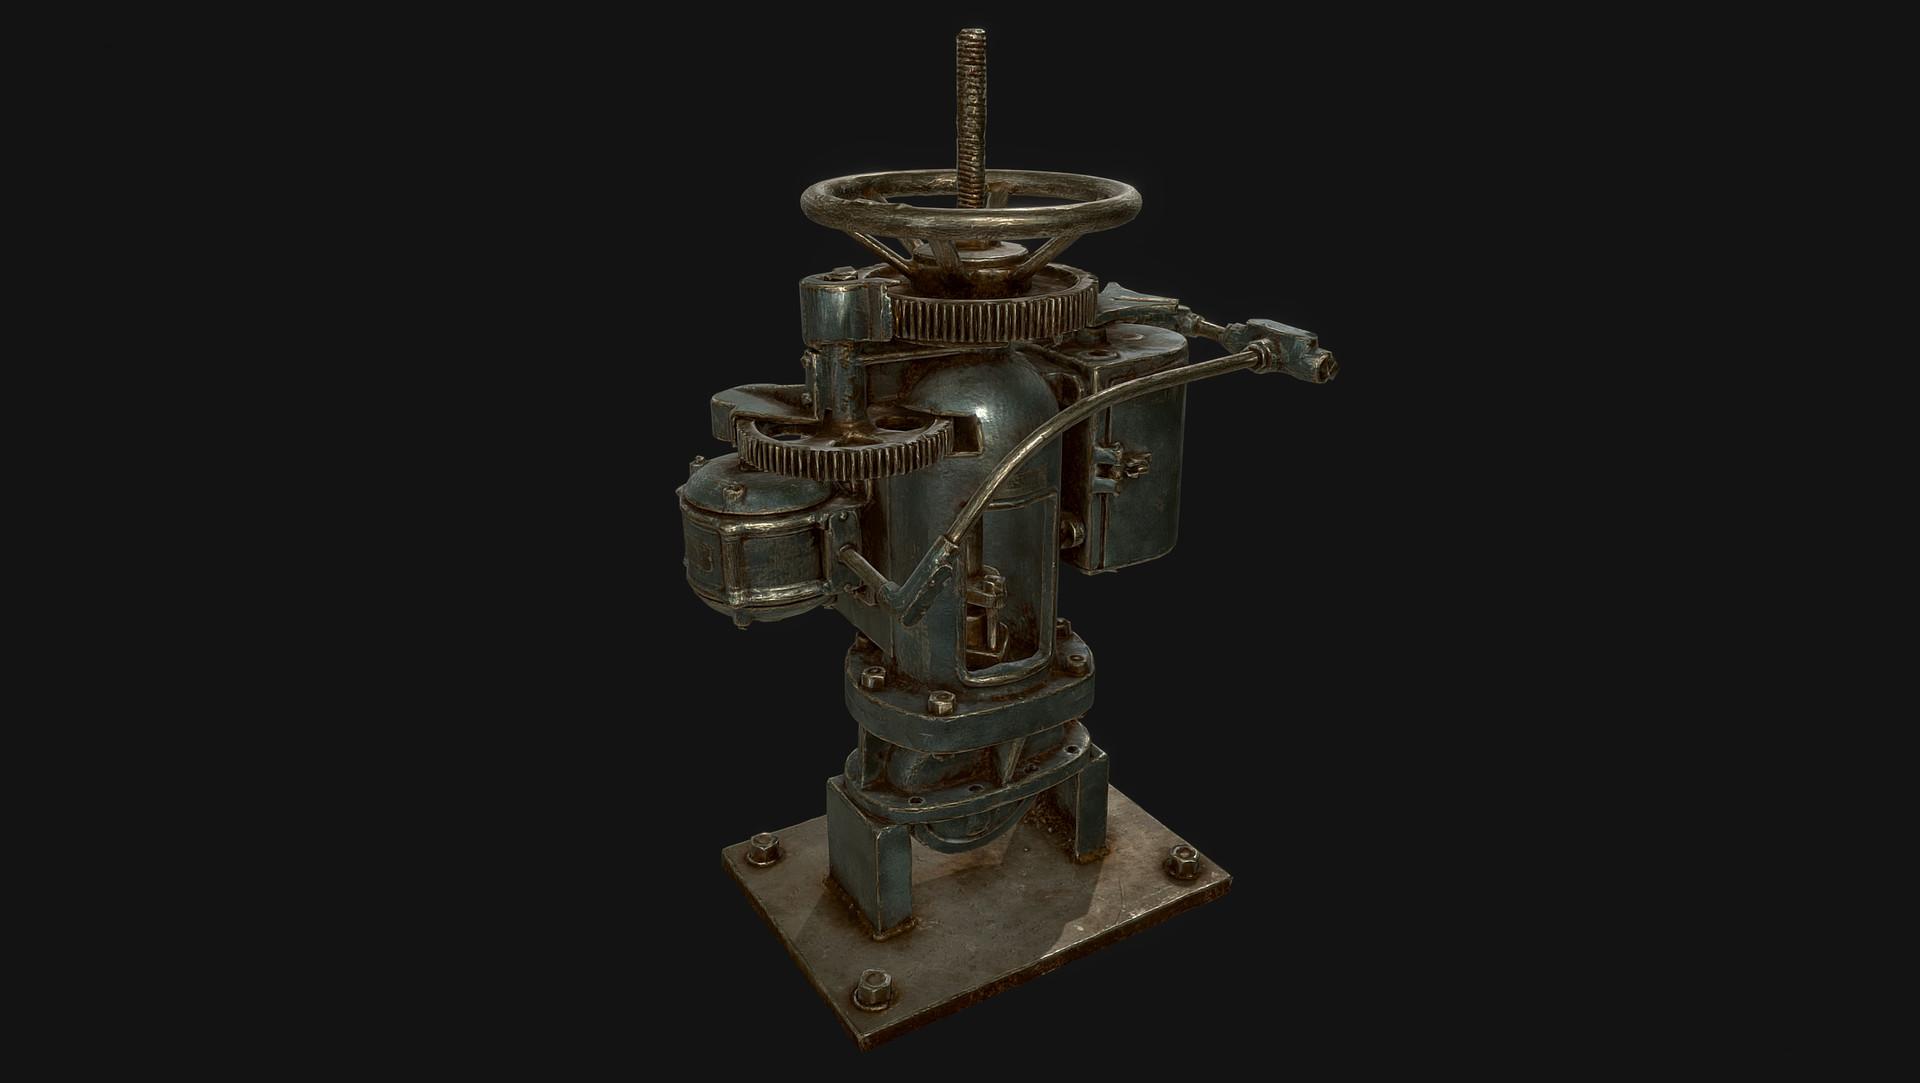 Robert max ramirez valve2